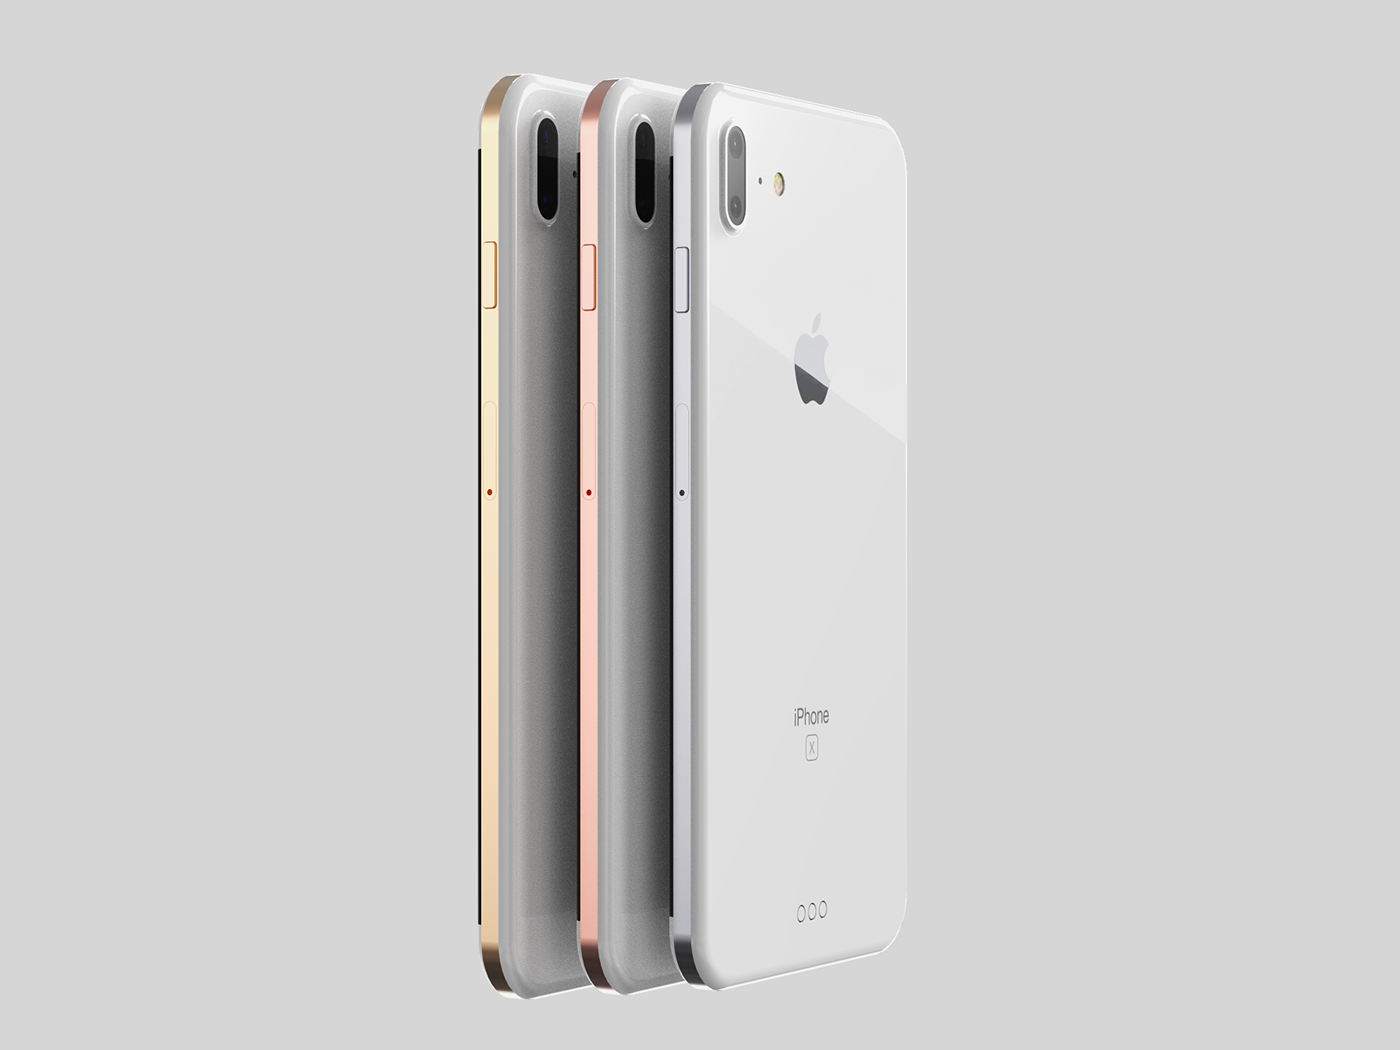 Apple iPhone 8 to Feature a Redesigned Fingerprint Sensor